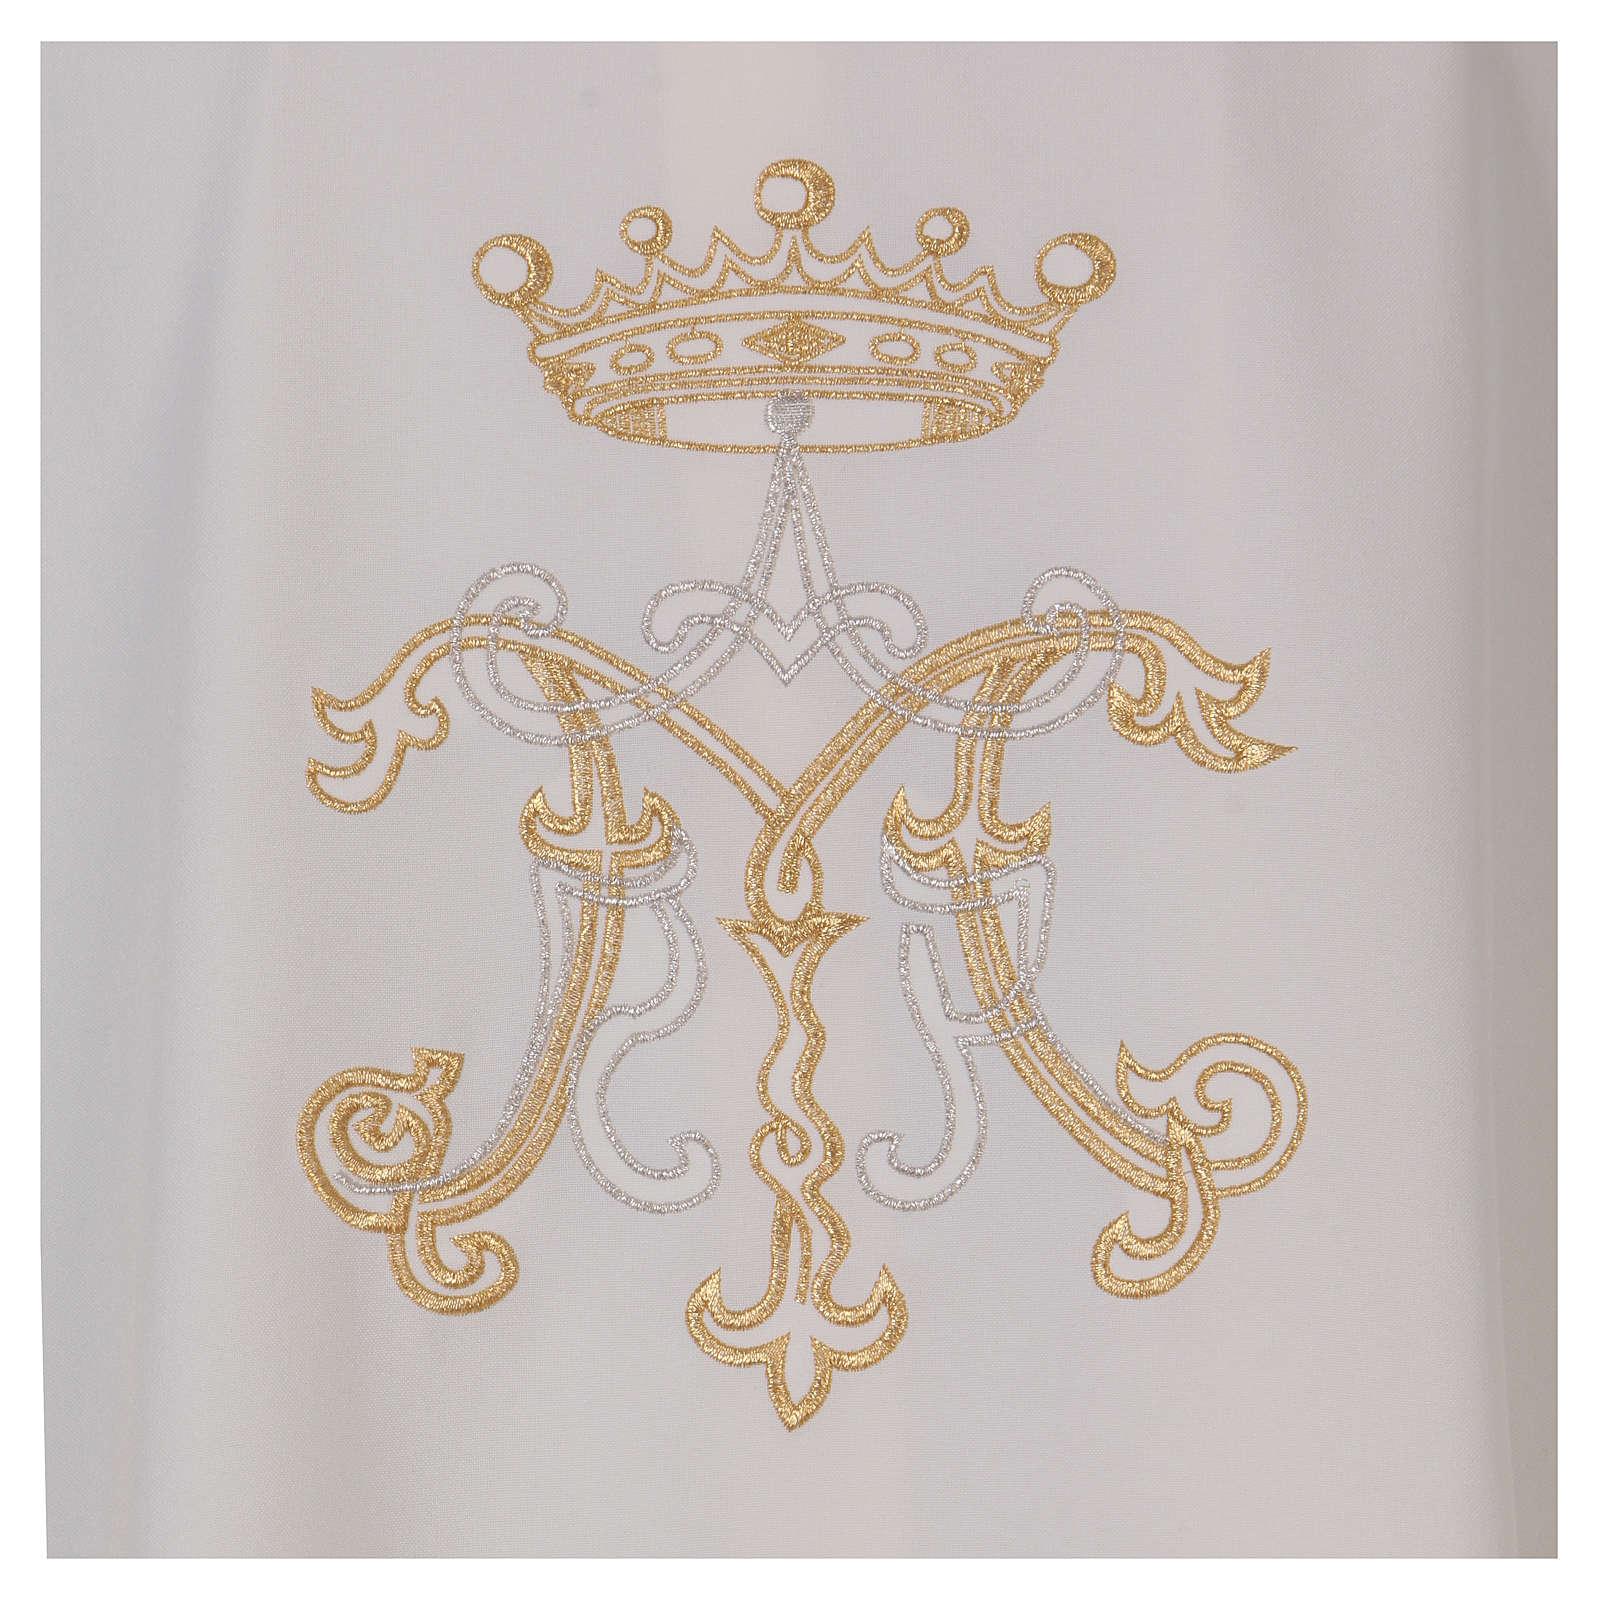 Casulla bordada símbolo mariano 100% poliéster 4